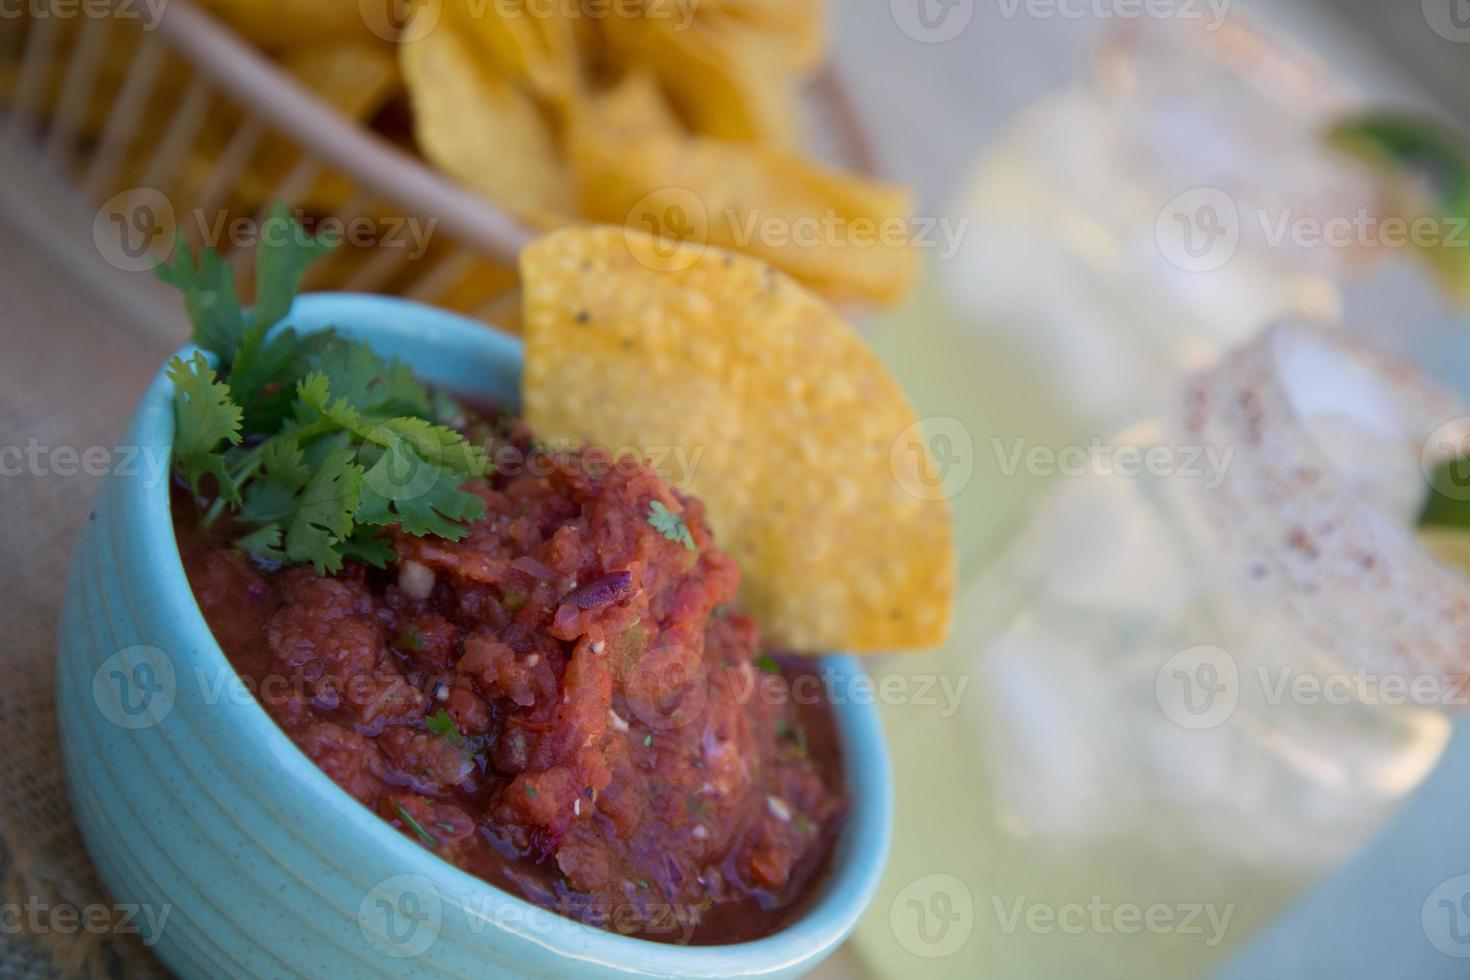 chips en salsa met margarita's. foto